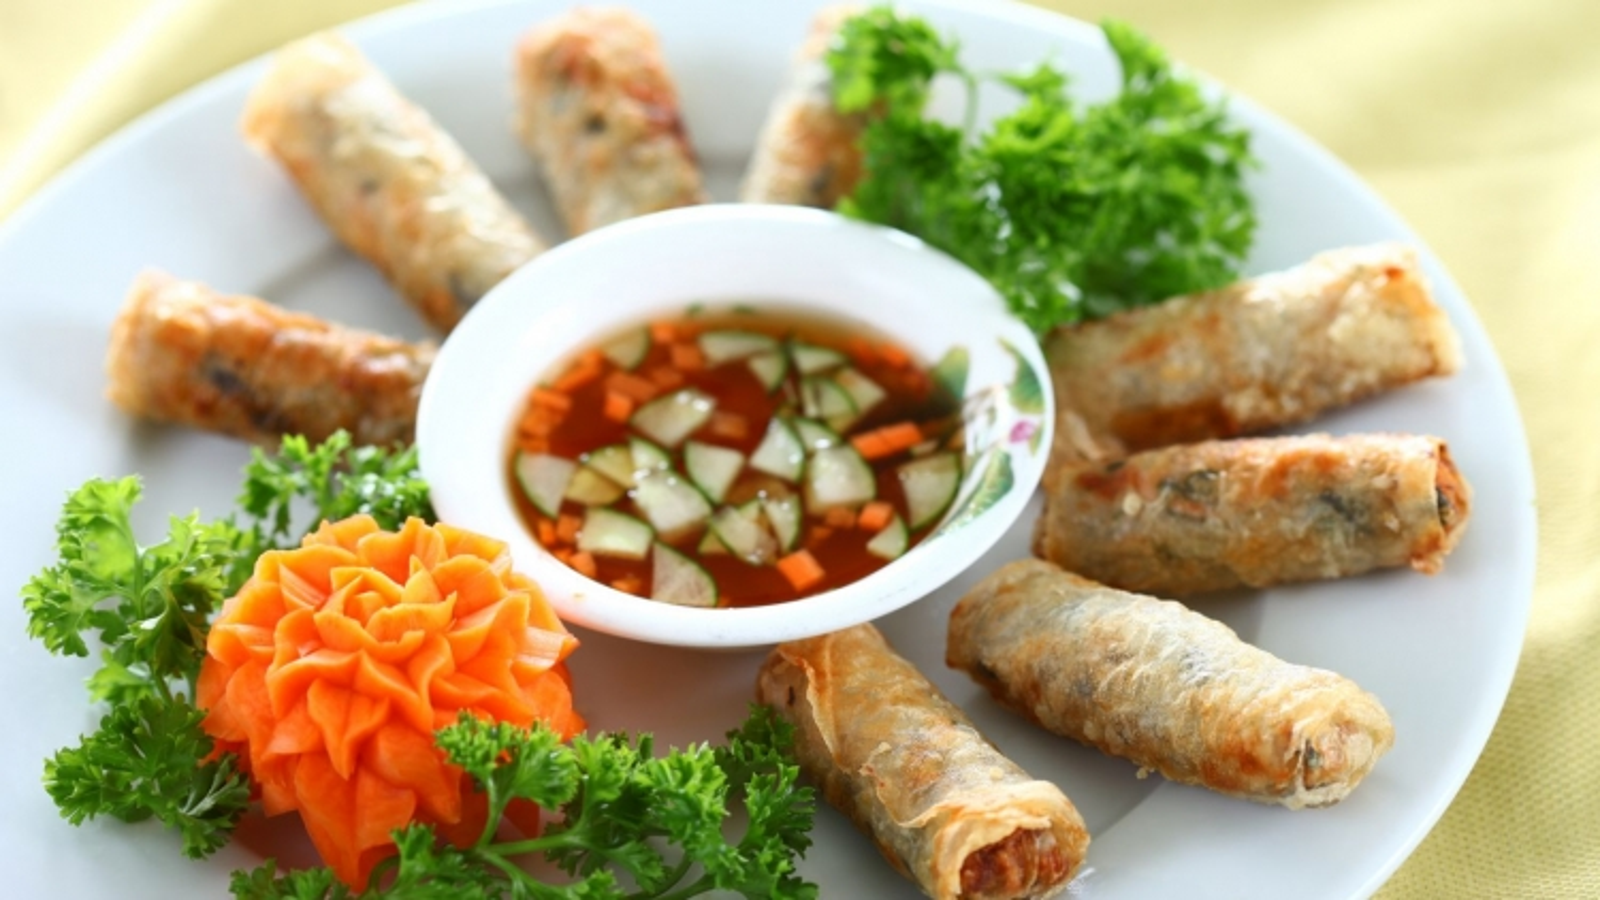 Vietnamese cuisine introduced at Singapore Francophonie Festival